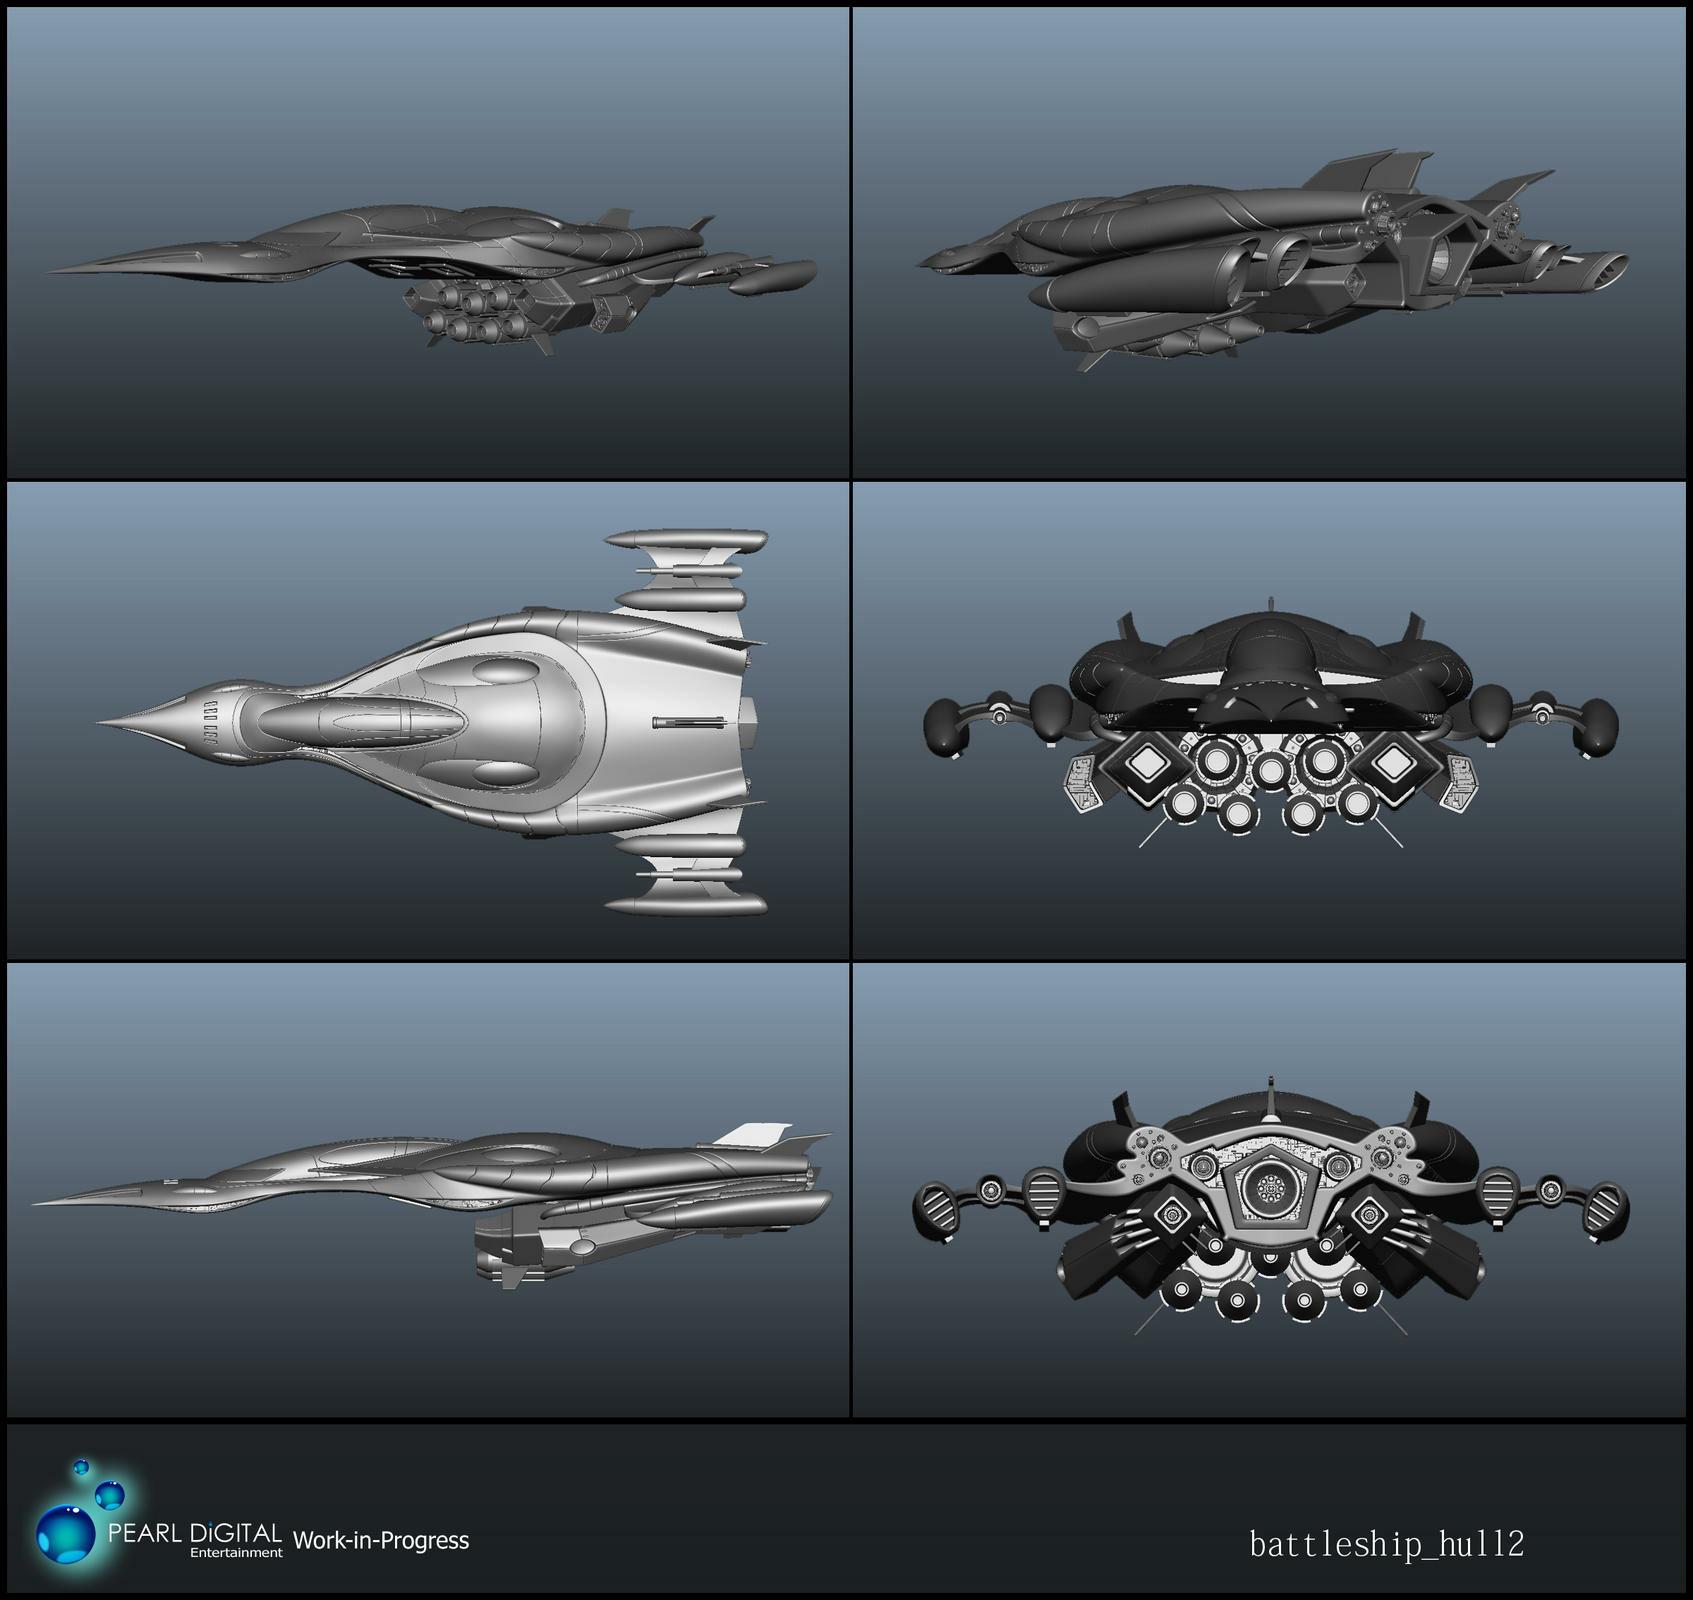 Sherif habashi 13 battleship hull2